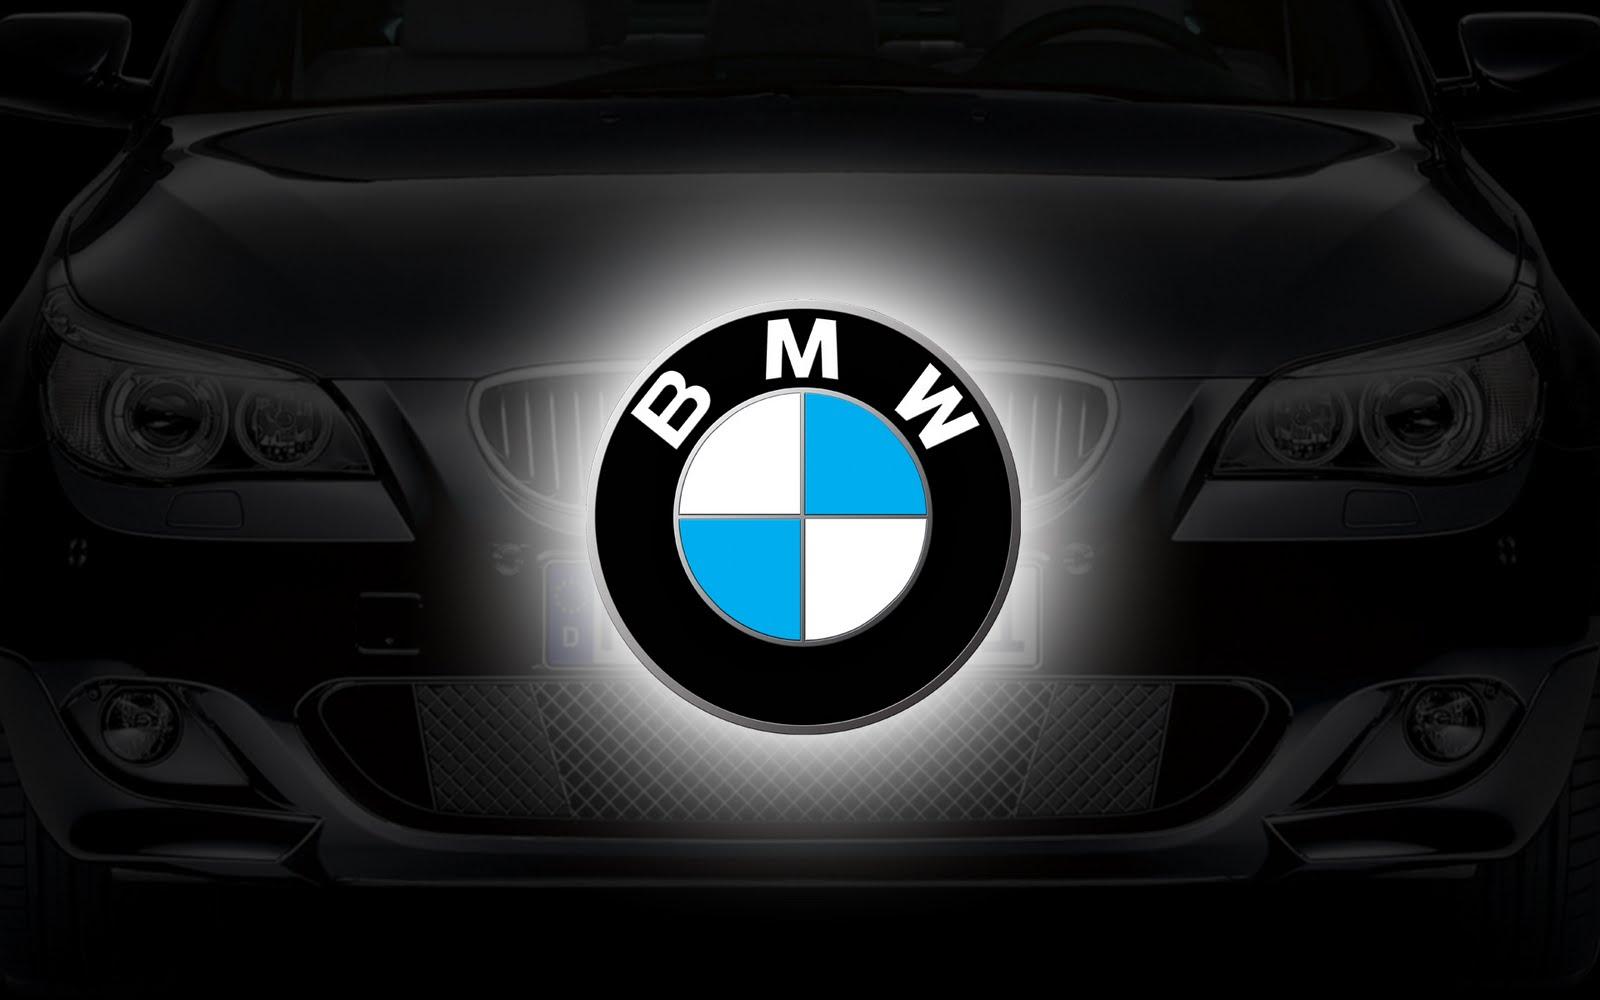 Hot cars BMW logo bmw 2011 logo bmw logo png jpg 1600x1000